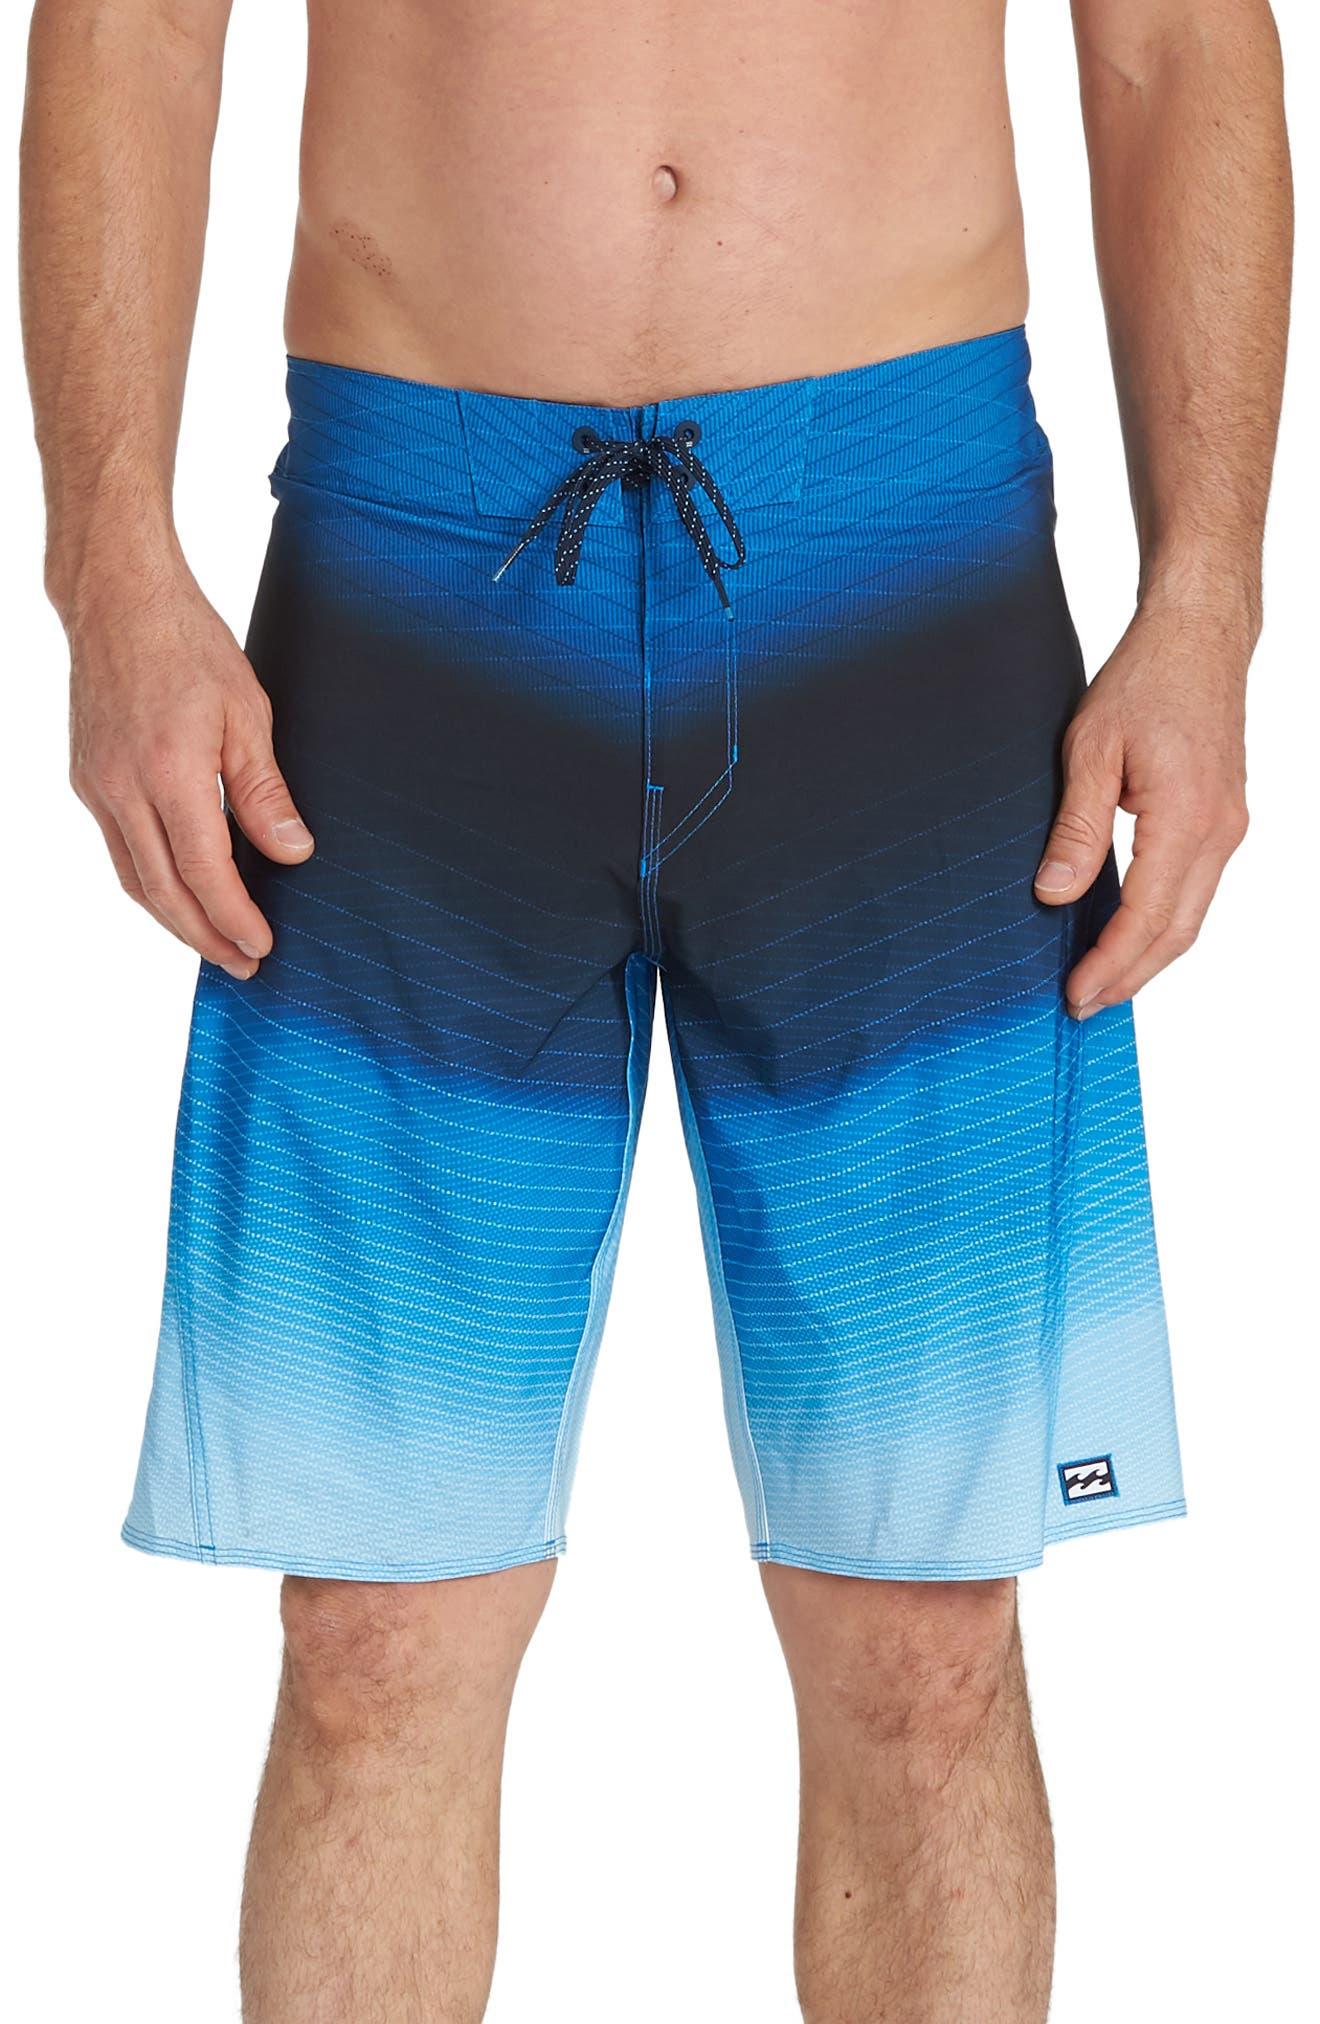 Billabong Fluid Pro Board Shorts, Blue